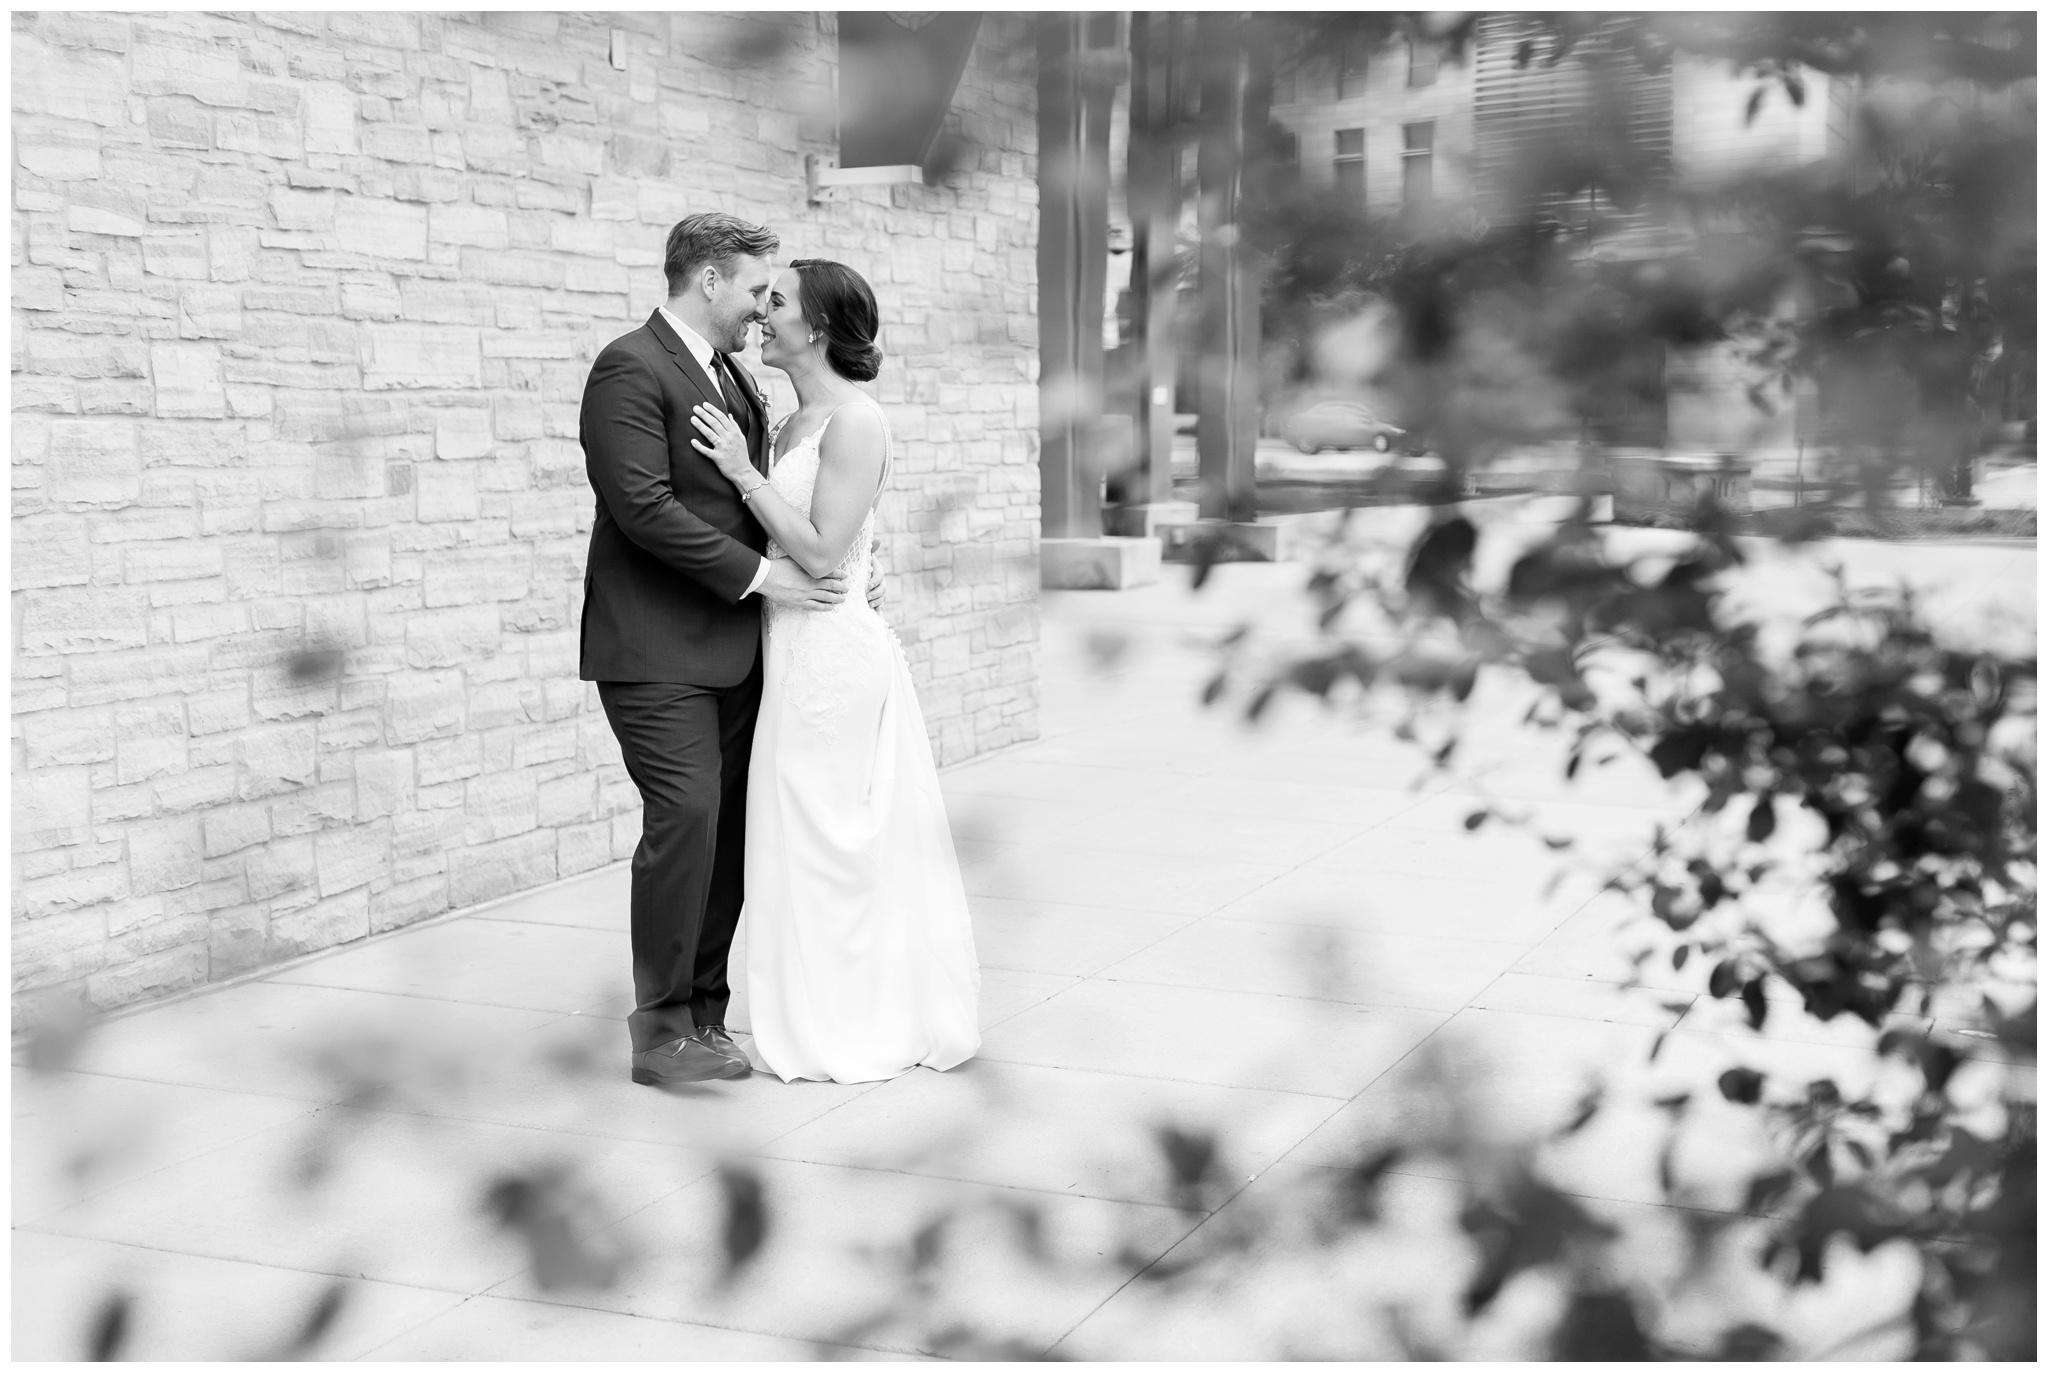 Union_south_Wedding_Madison_Wisconsin_Caynay_Photo_3682.jpg